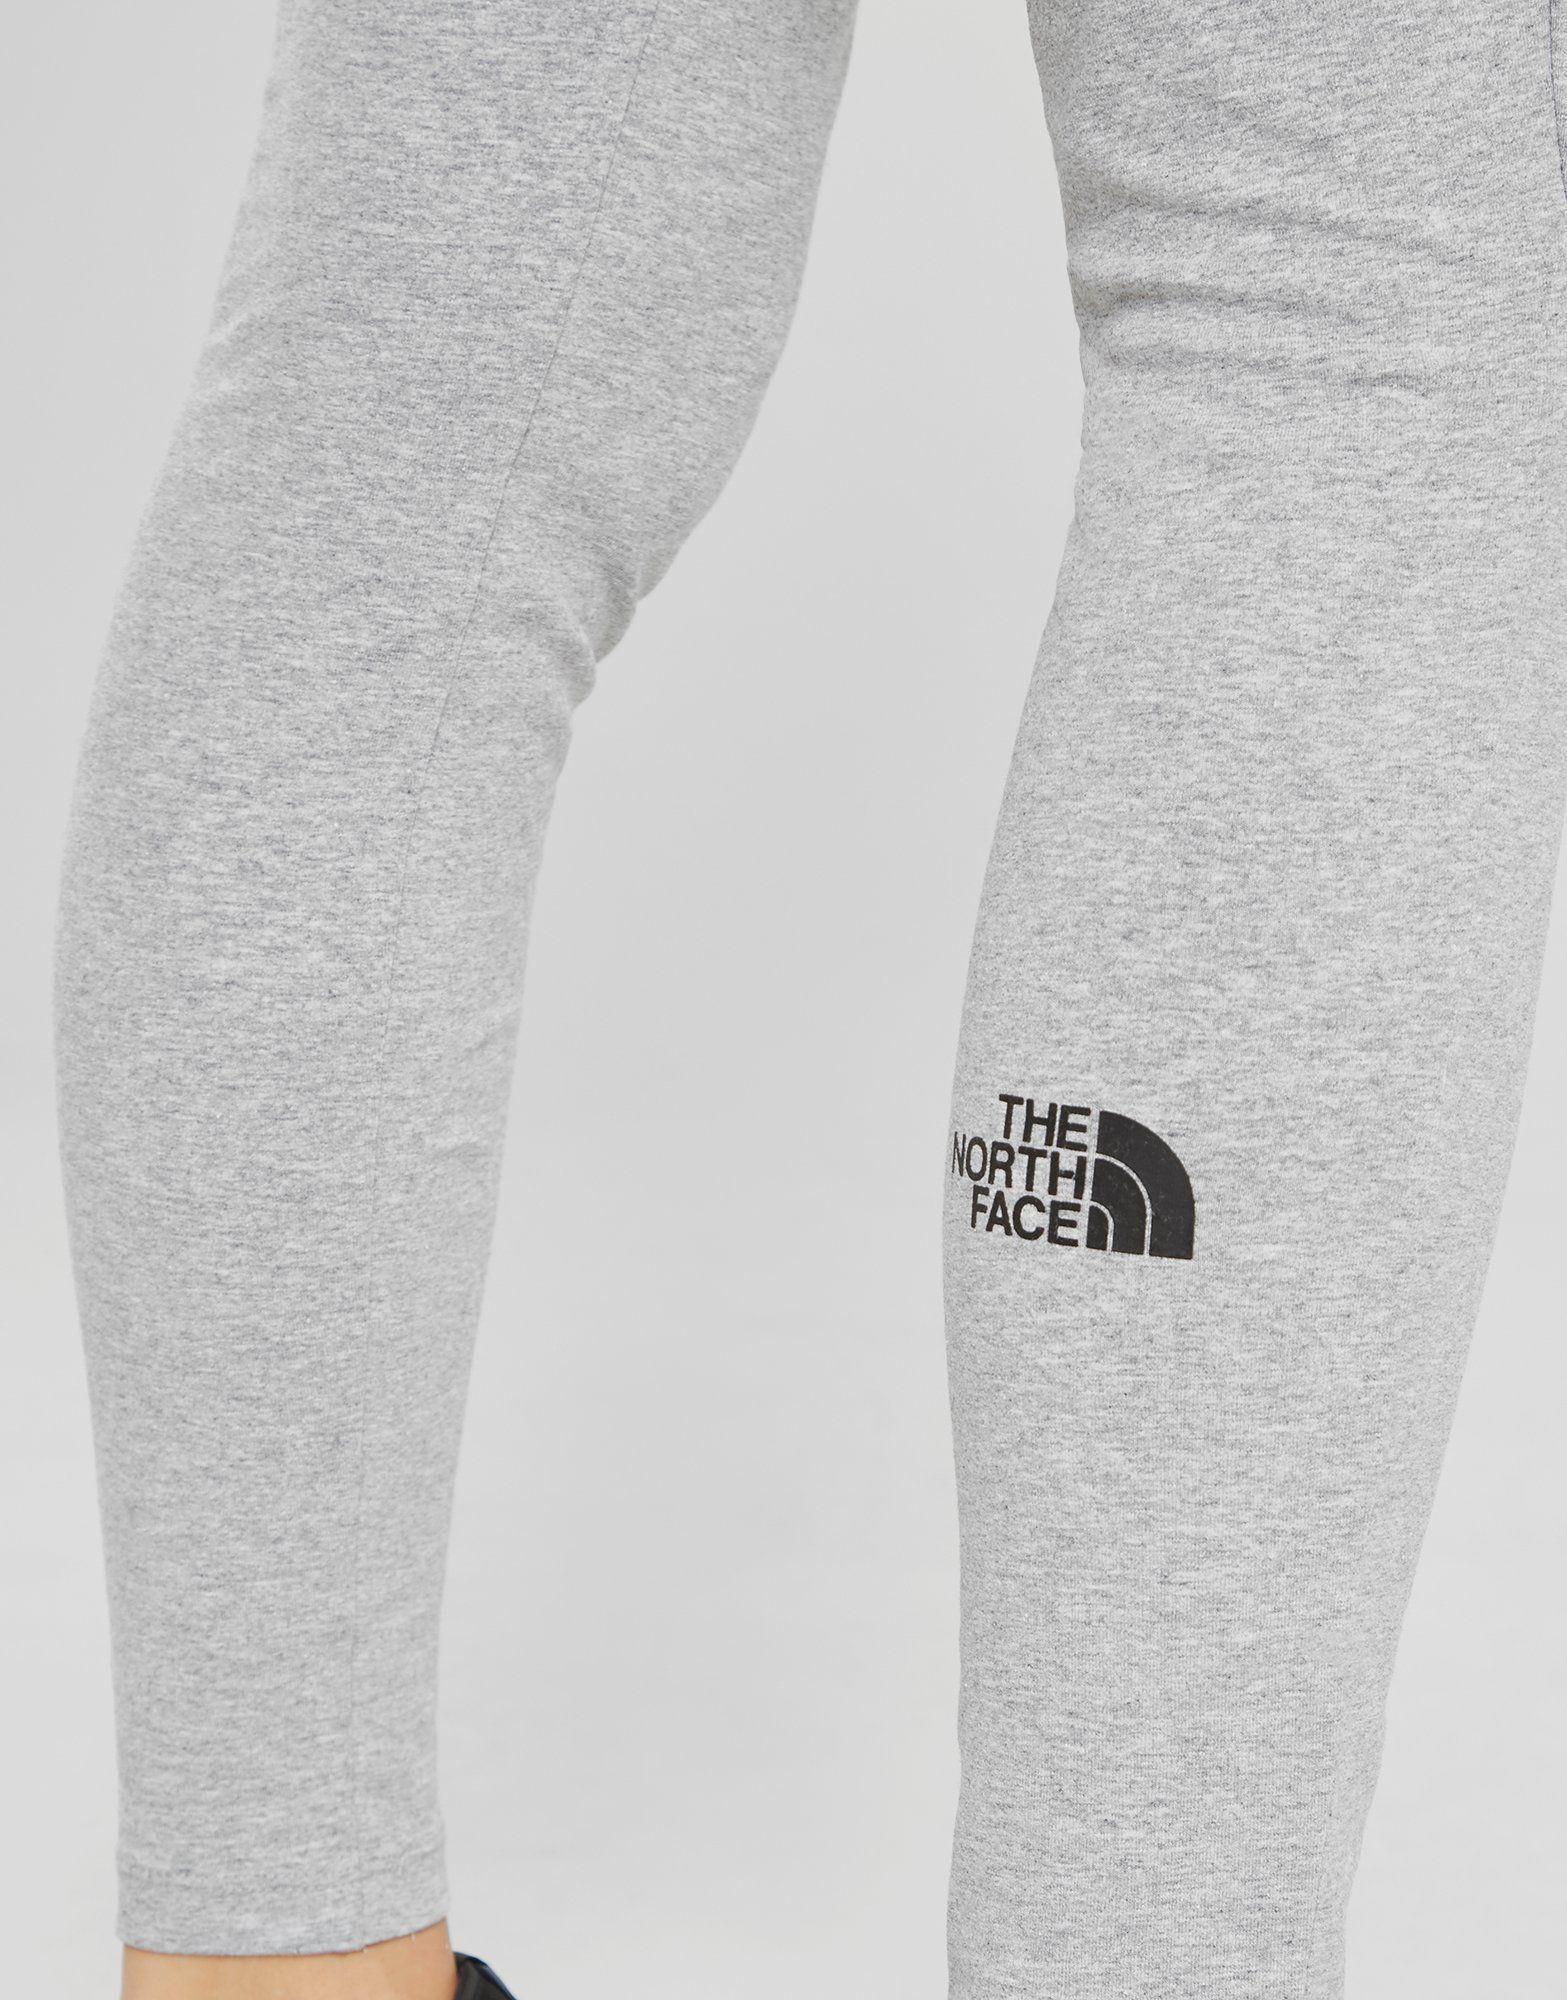 The North Face Legging Femme